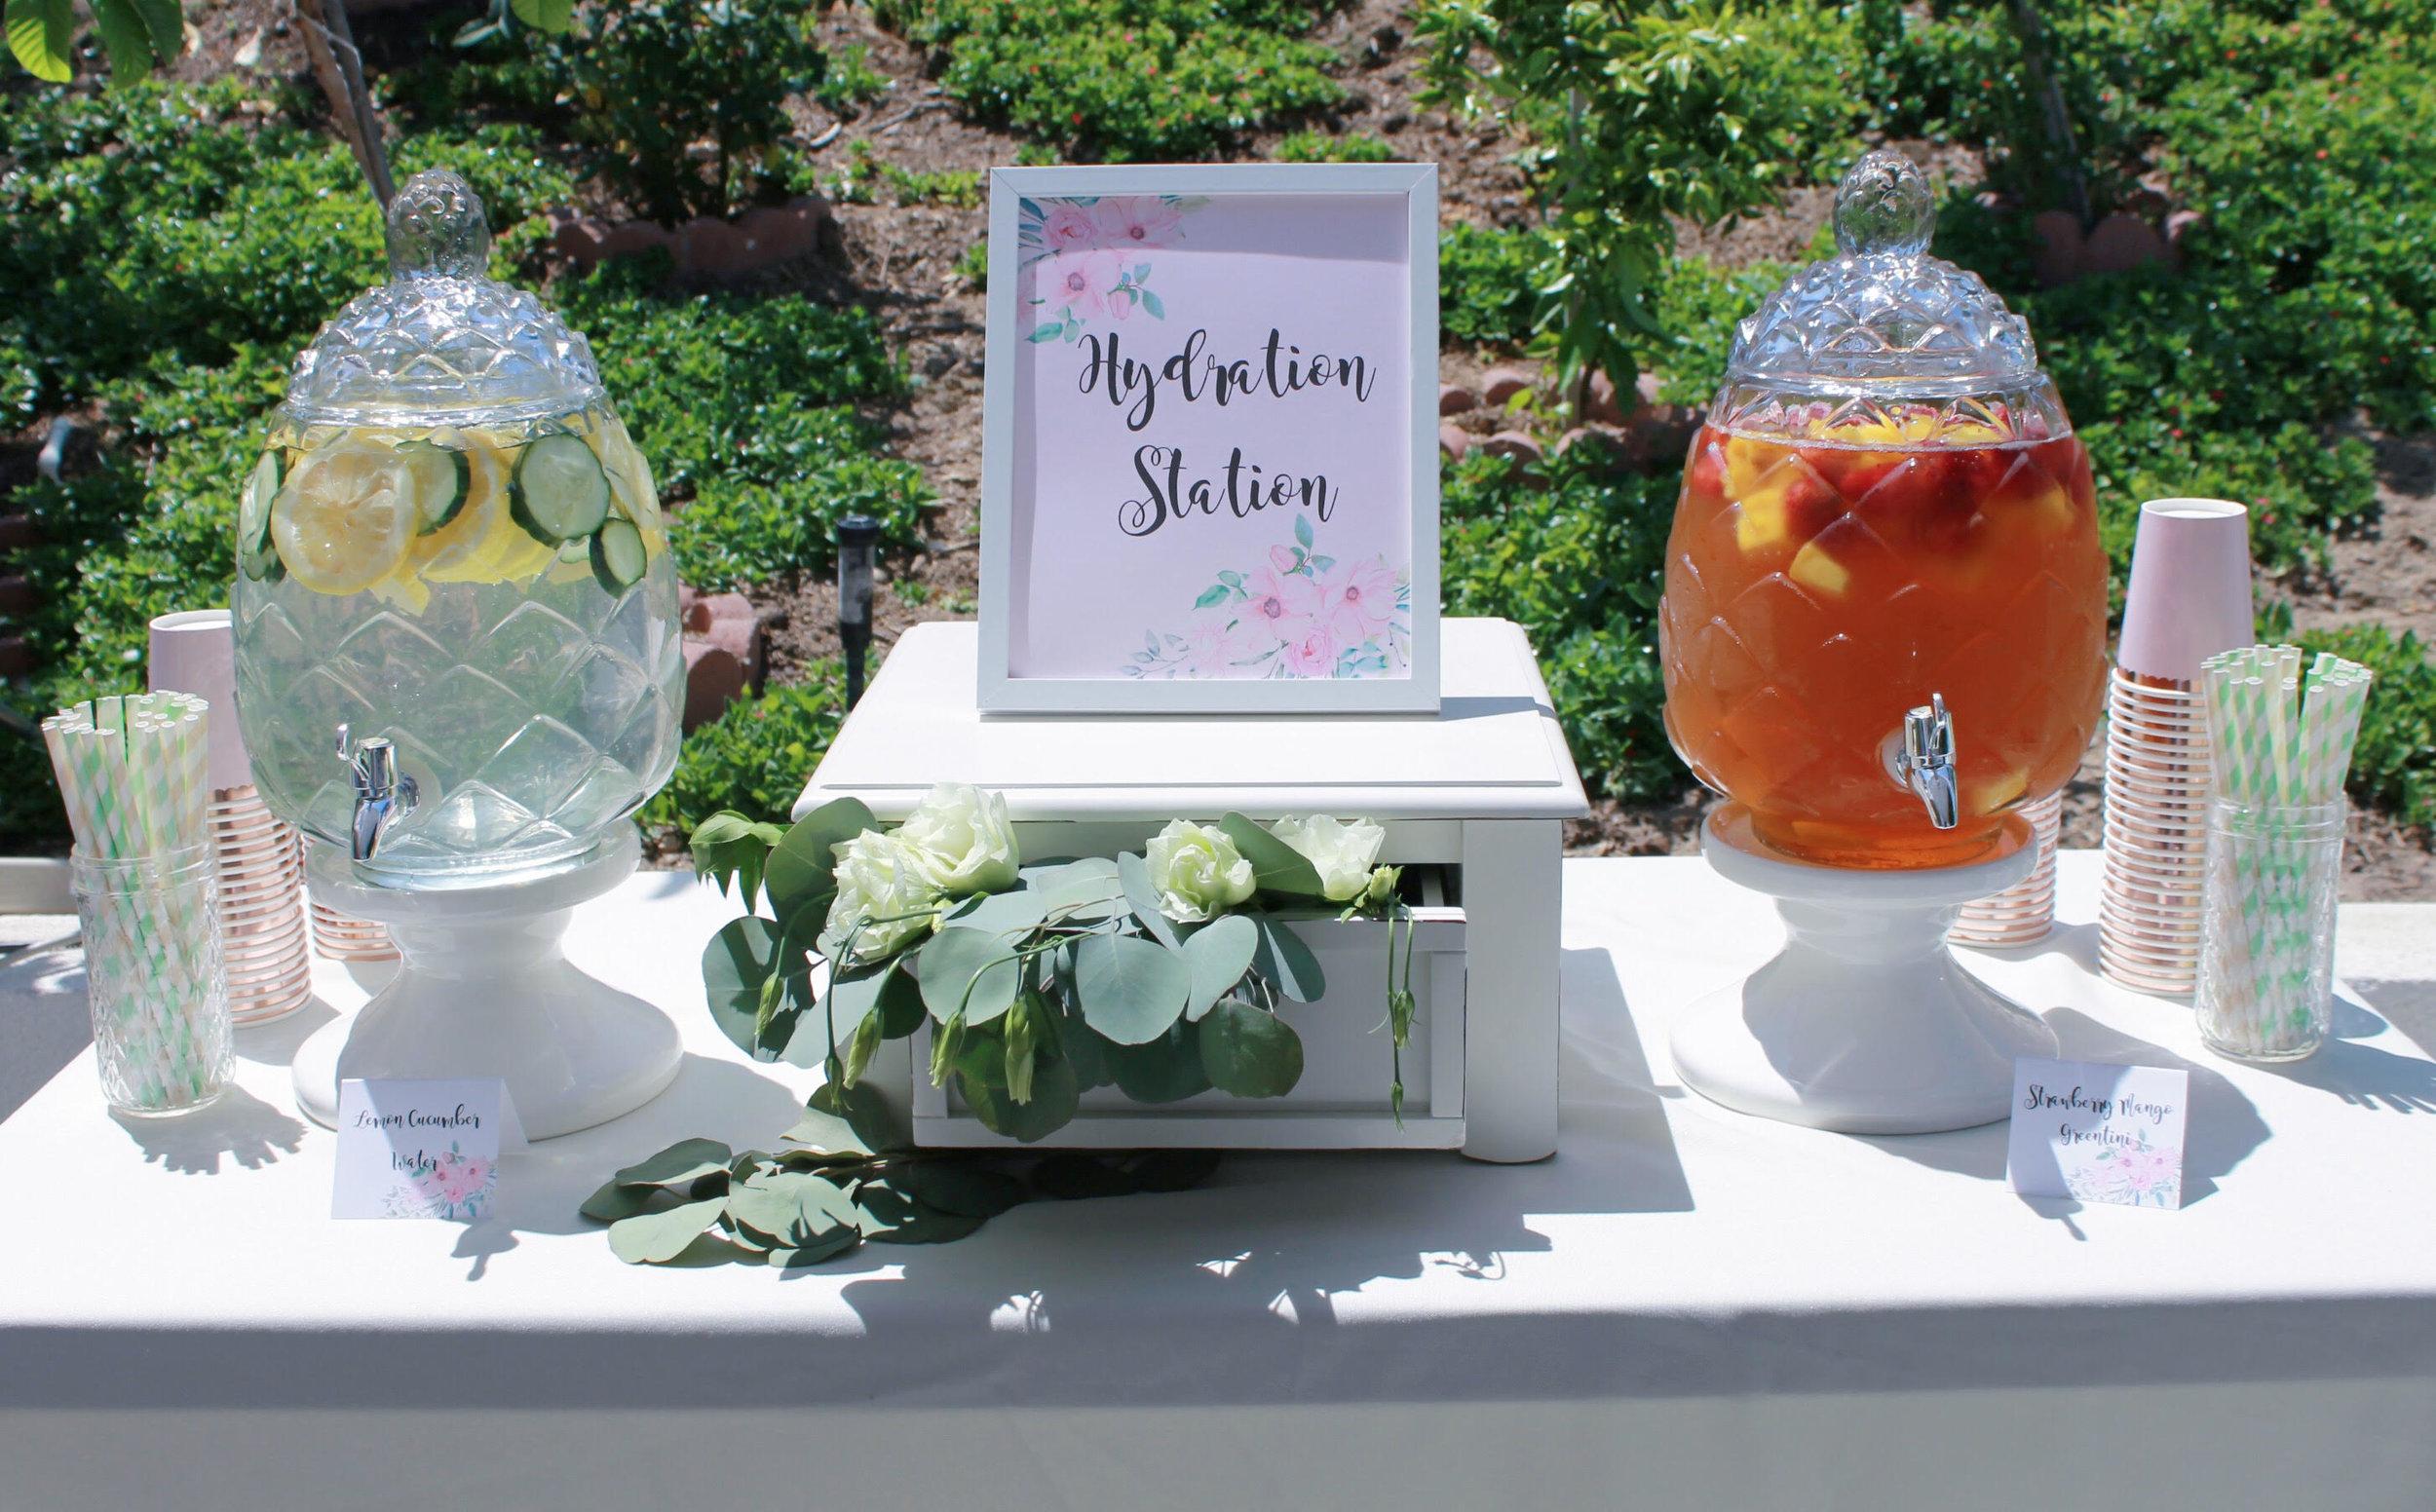 Hydration Station-Drink Station-Bridal Showerr-www.Sugarpartiesla.com.jpg